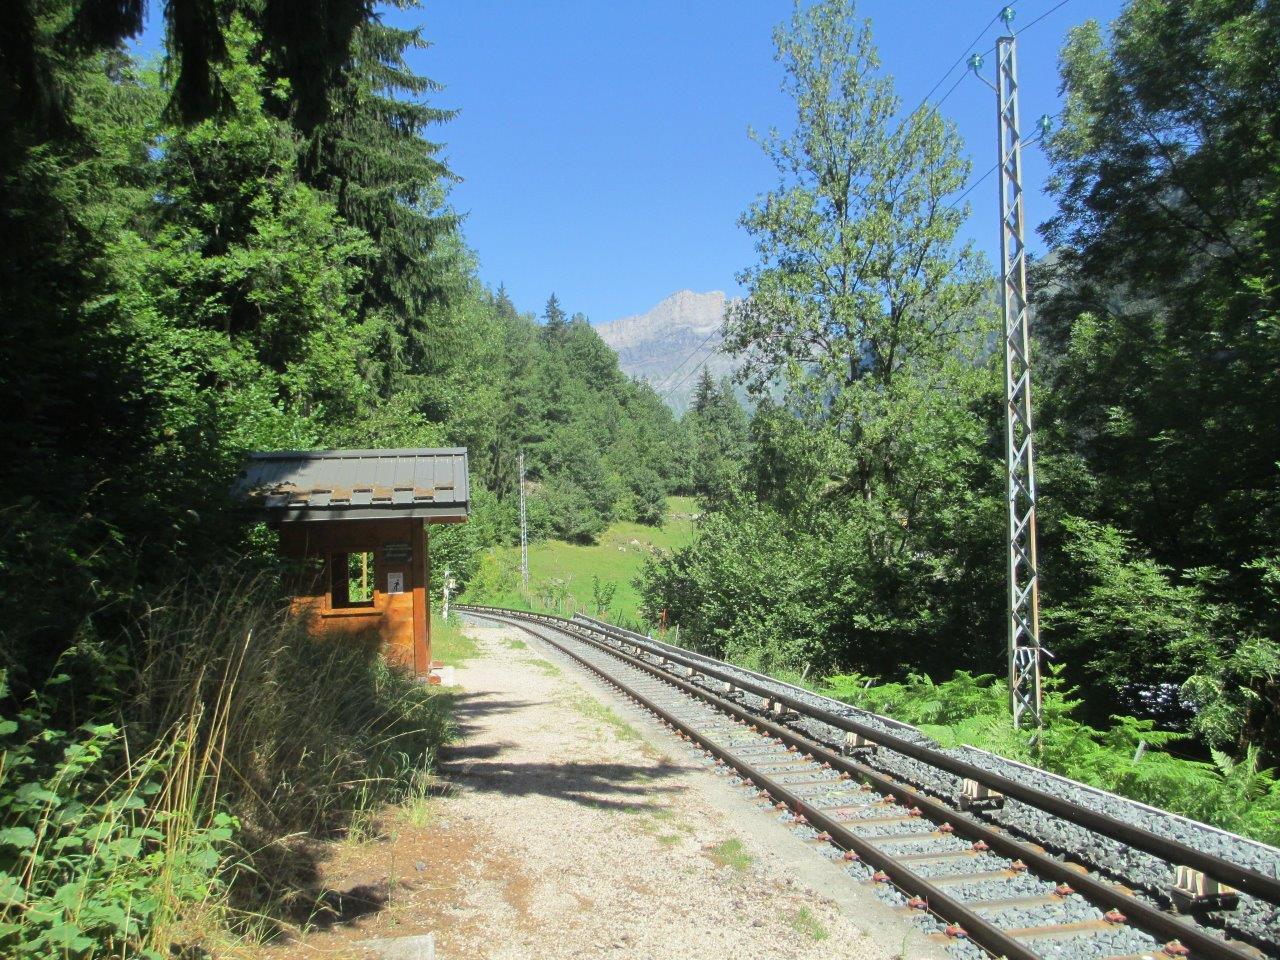 gare-de-vaudagne-train-station